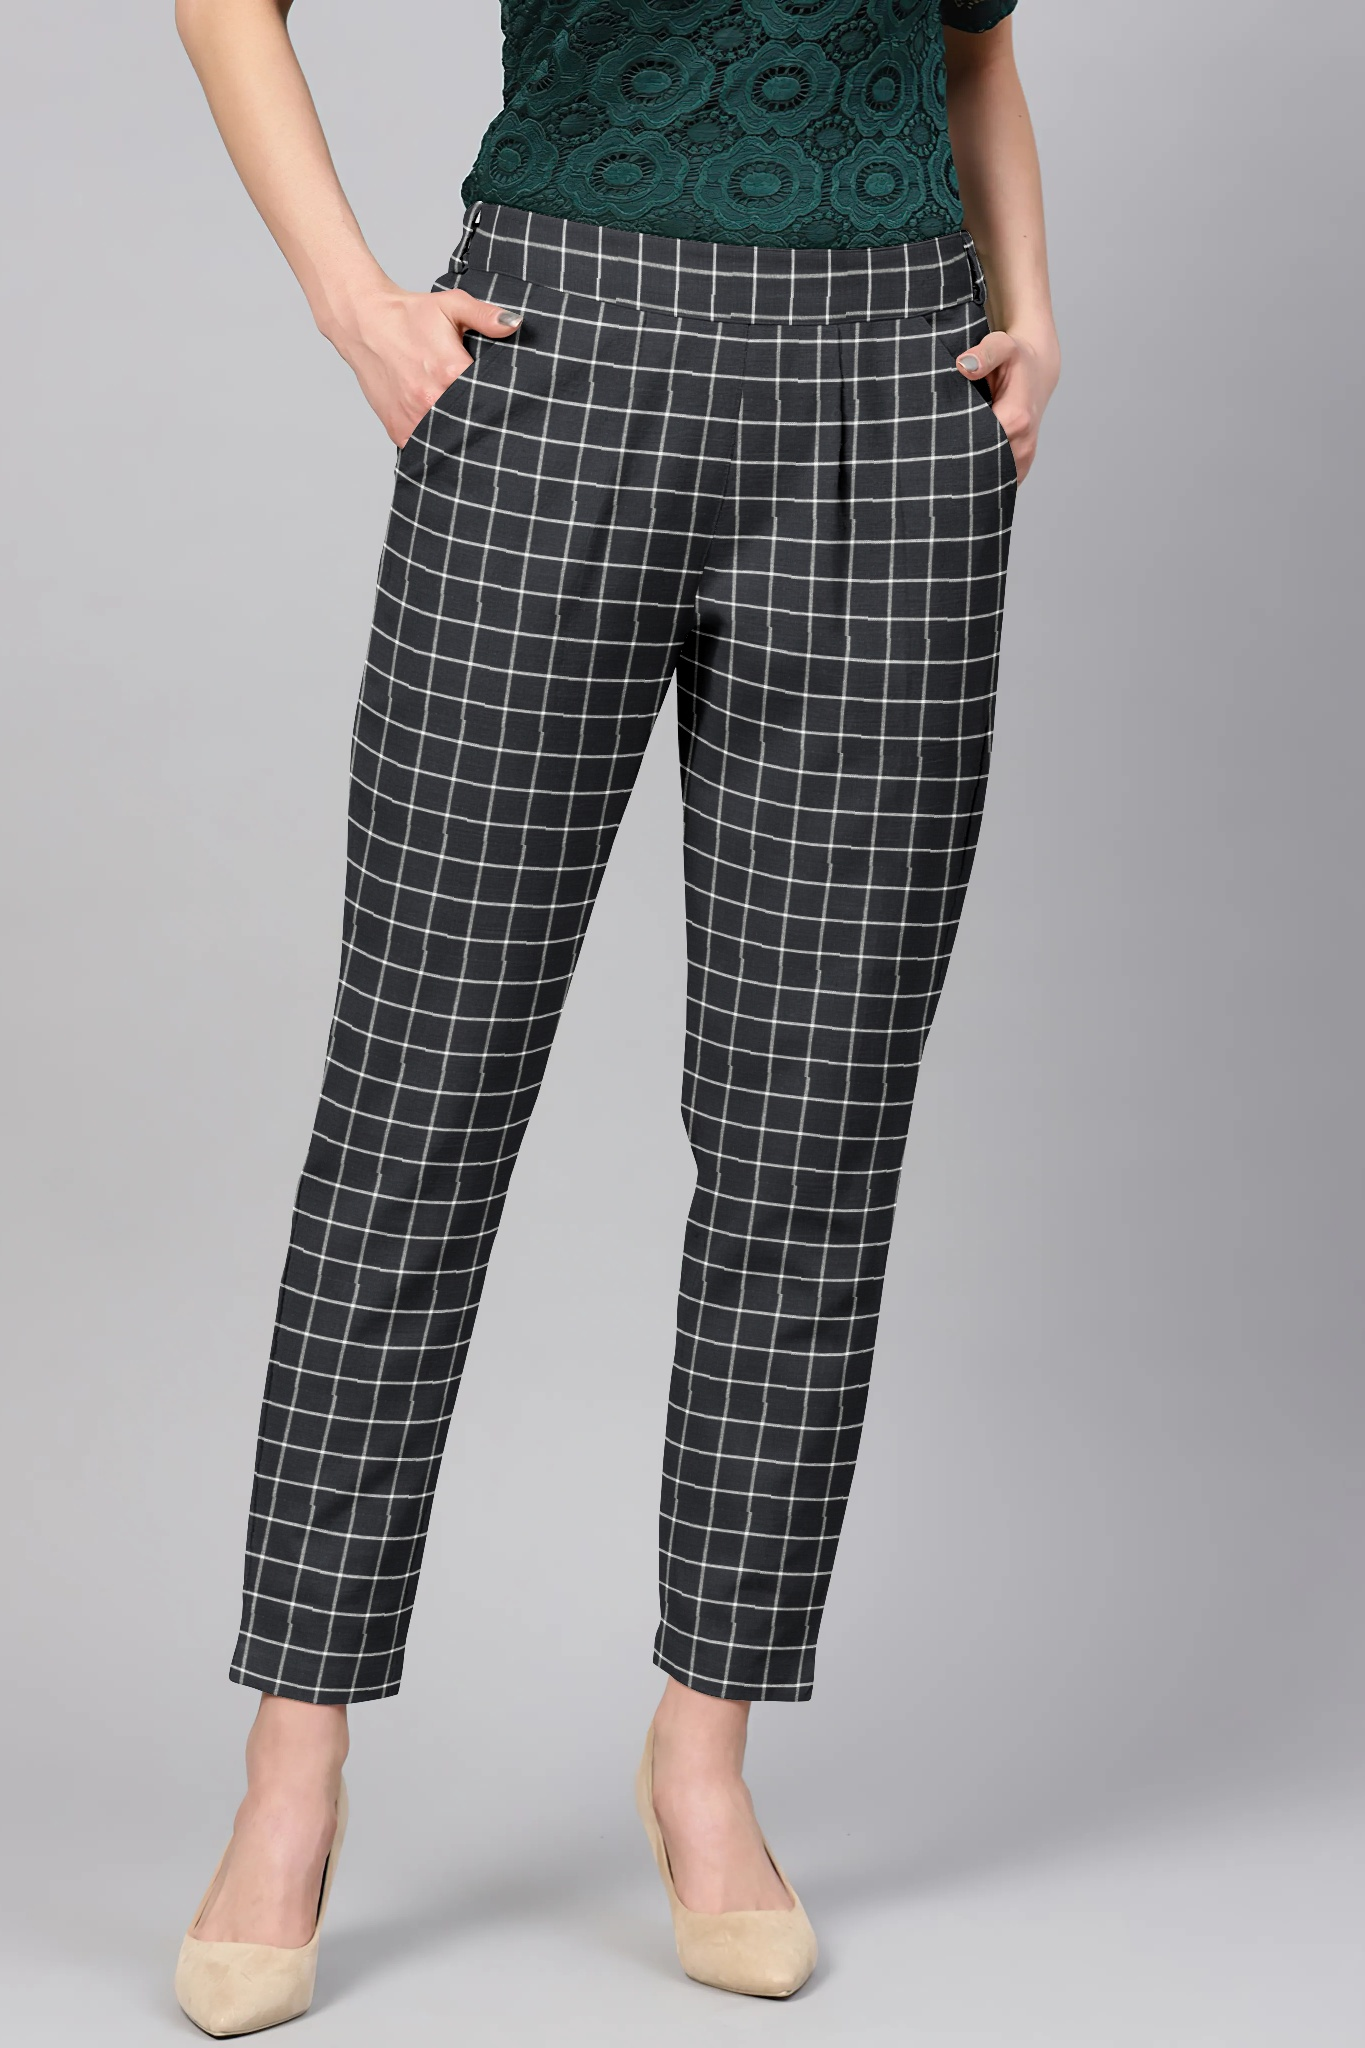 /home/customer/www/fabartcraft.com/public_html/uploadshttps://www.shopolics.com/uploads/images/medium/Black-White-Cotton-Check-Regular-Fit-Solid-Trouser-36095.jpg